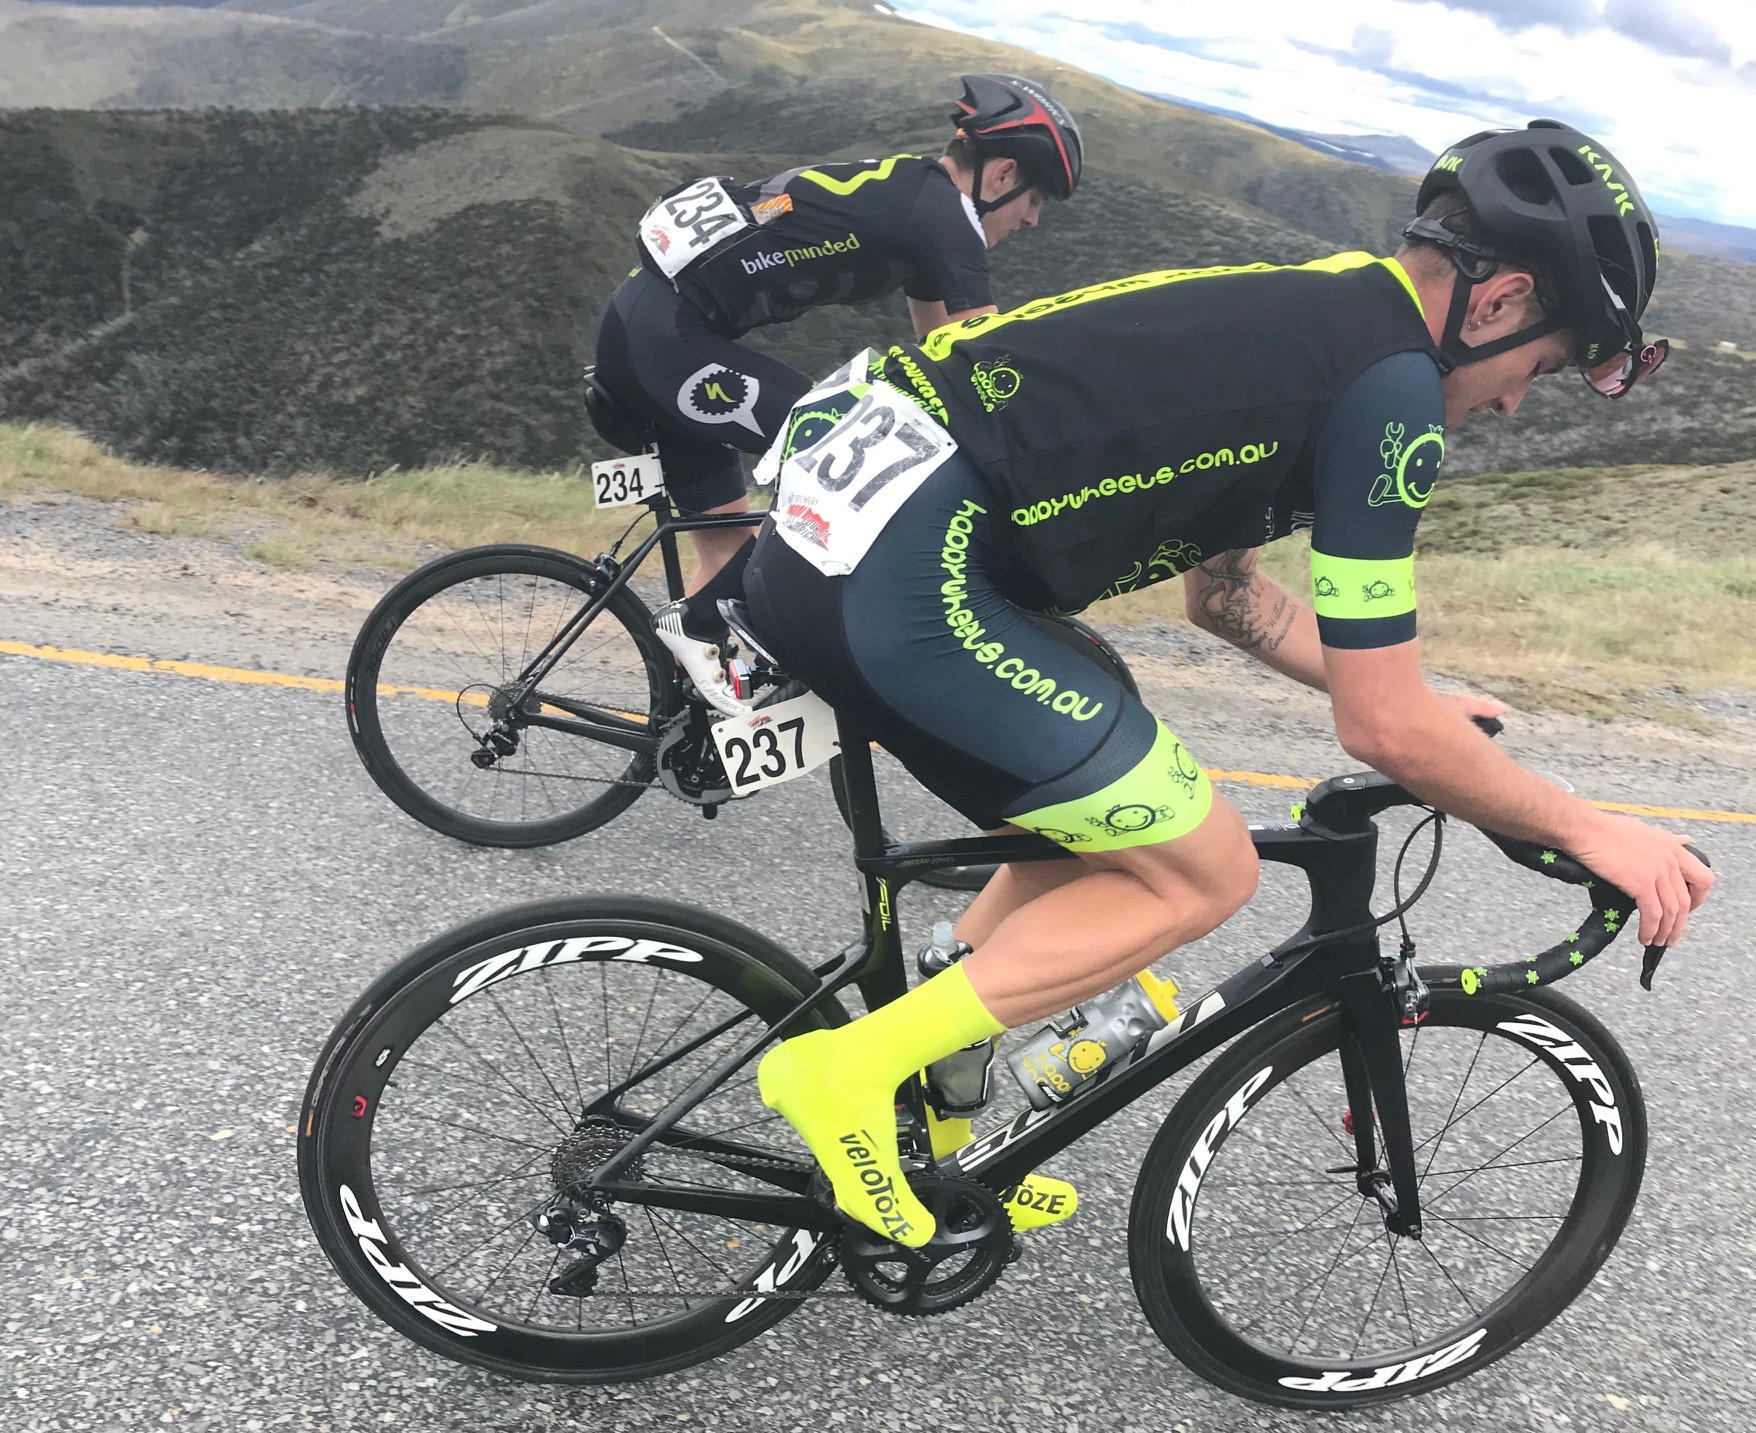 Tour of Bright 18 @ 2 Dec - Declan Jones approaching the Mount Hotham summit